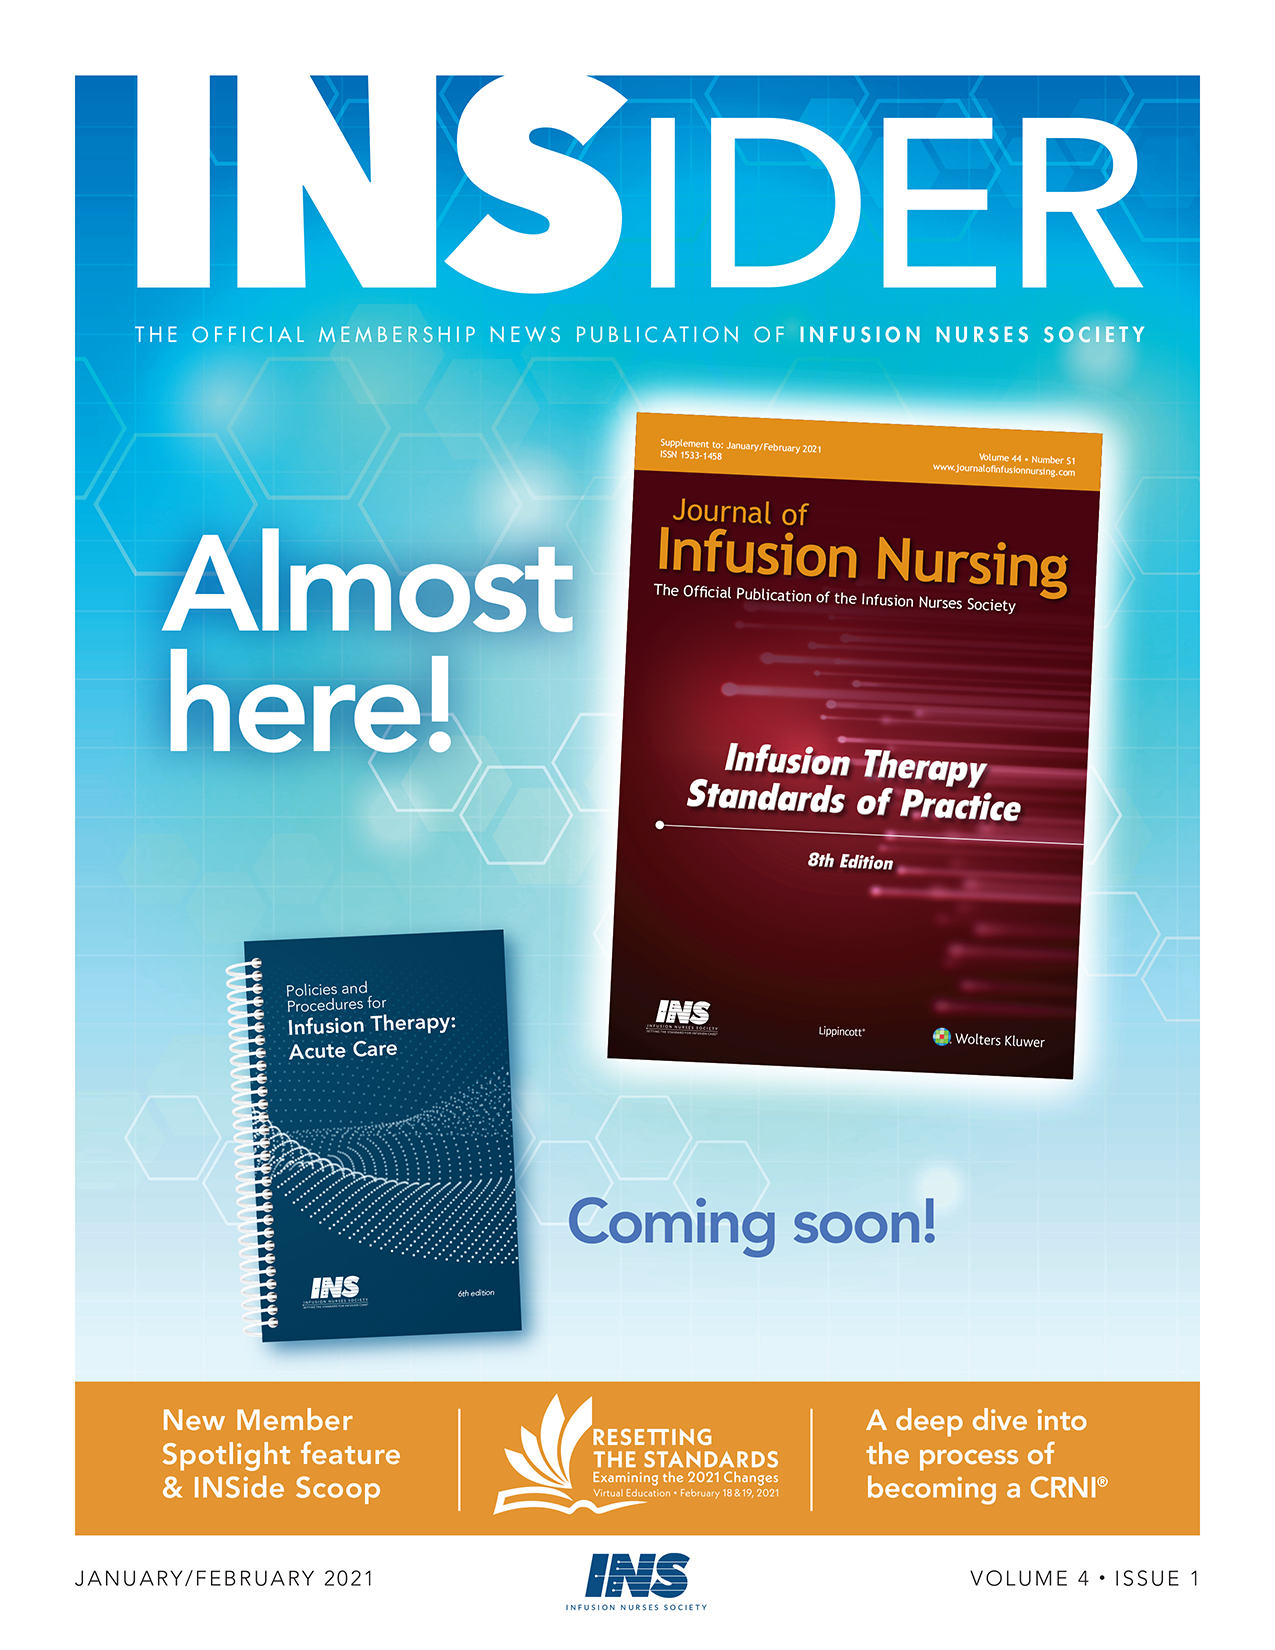 INSider January/February 2021